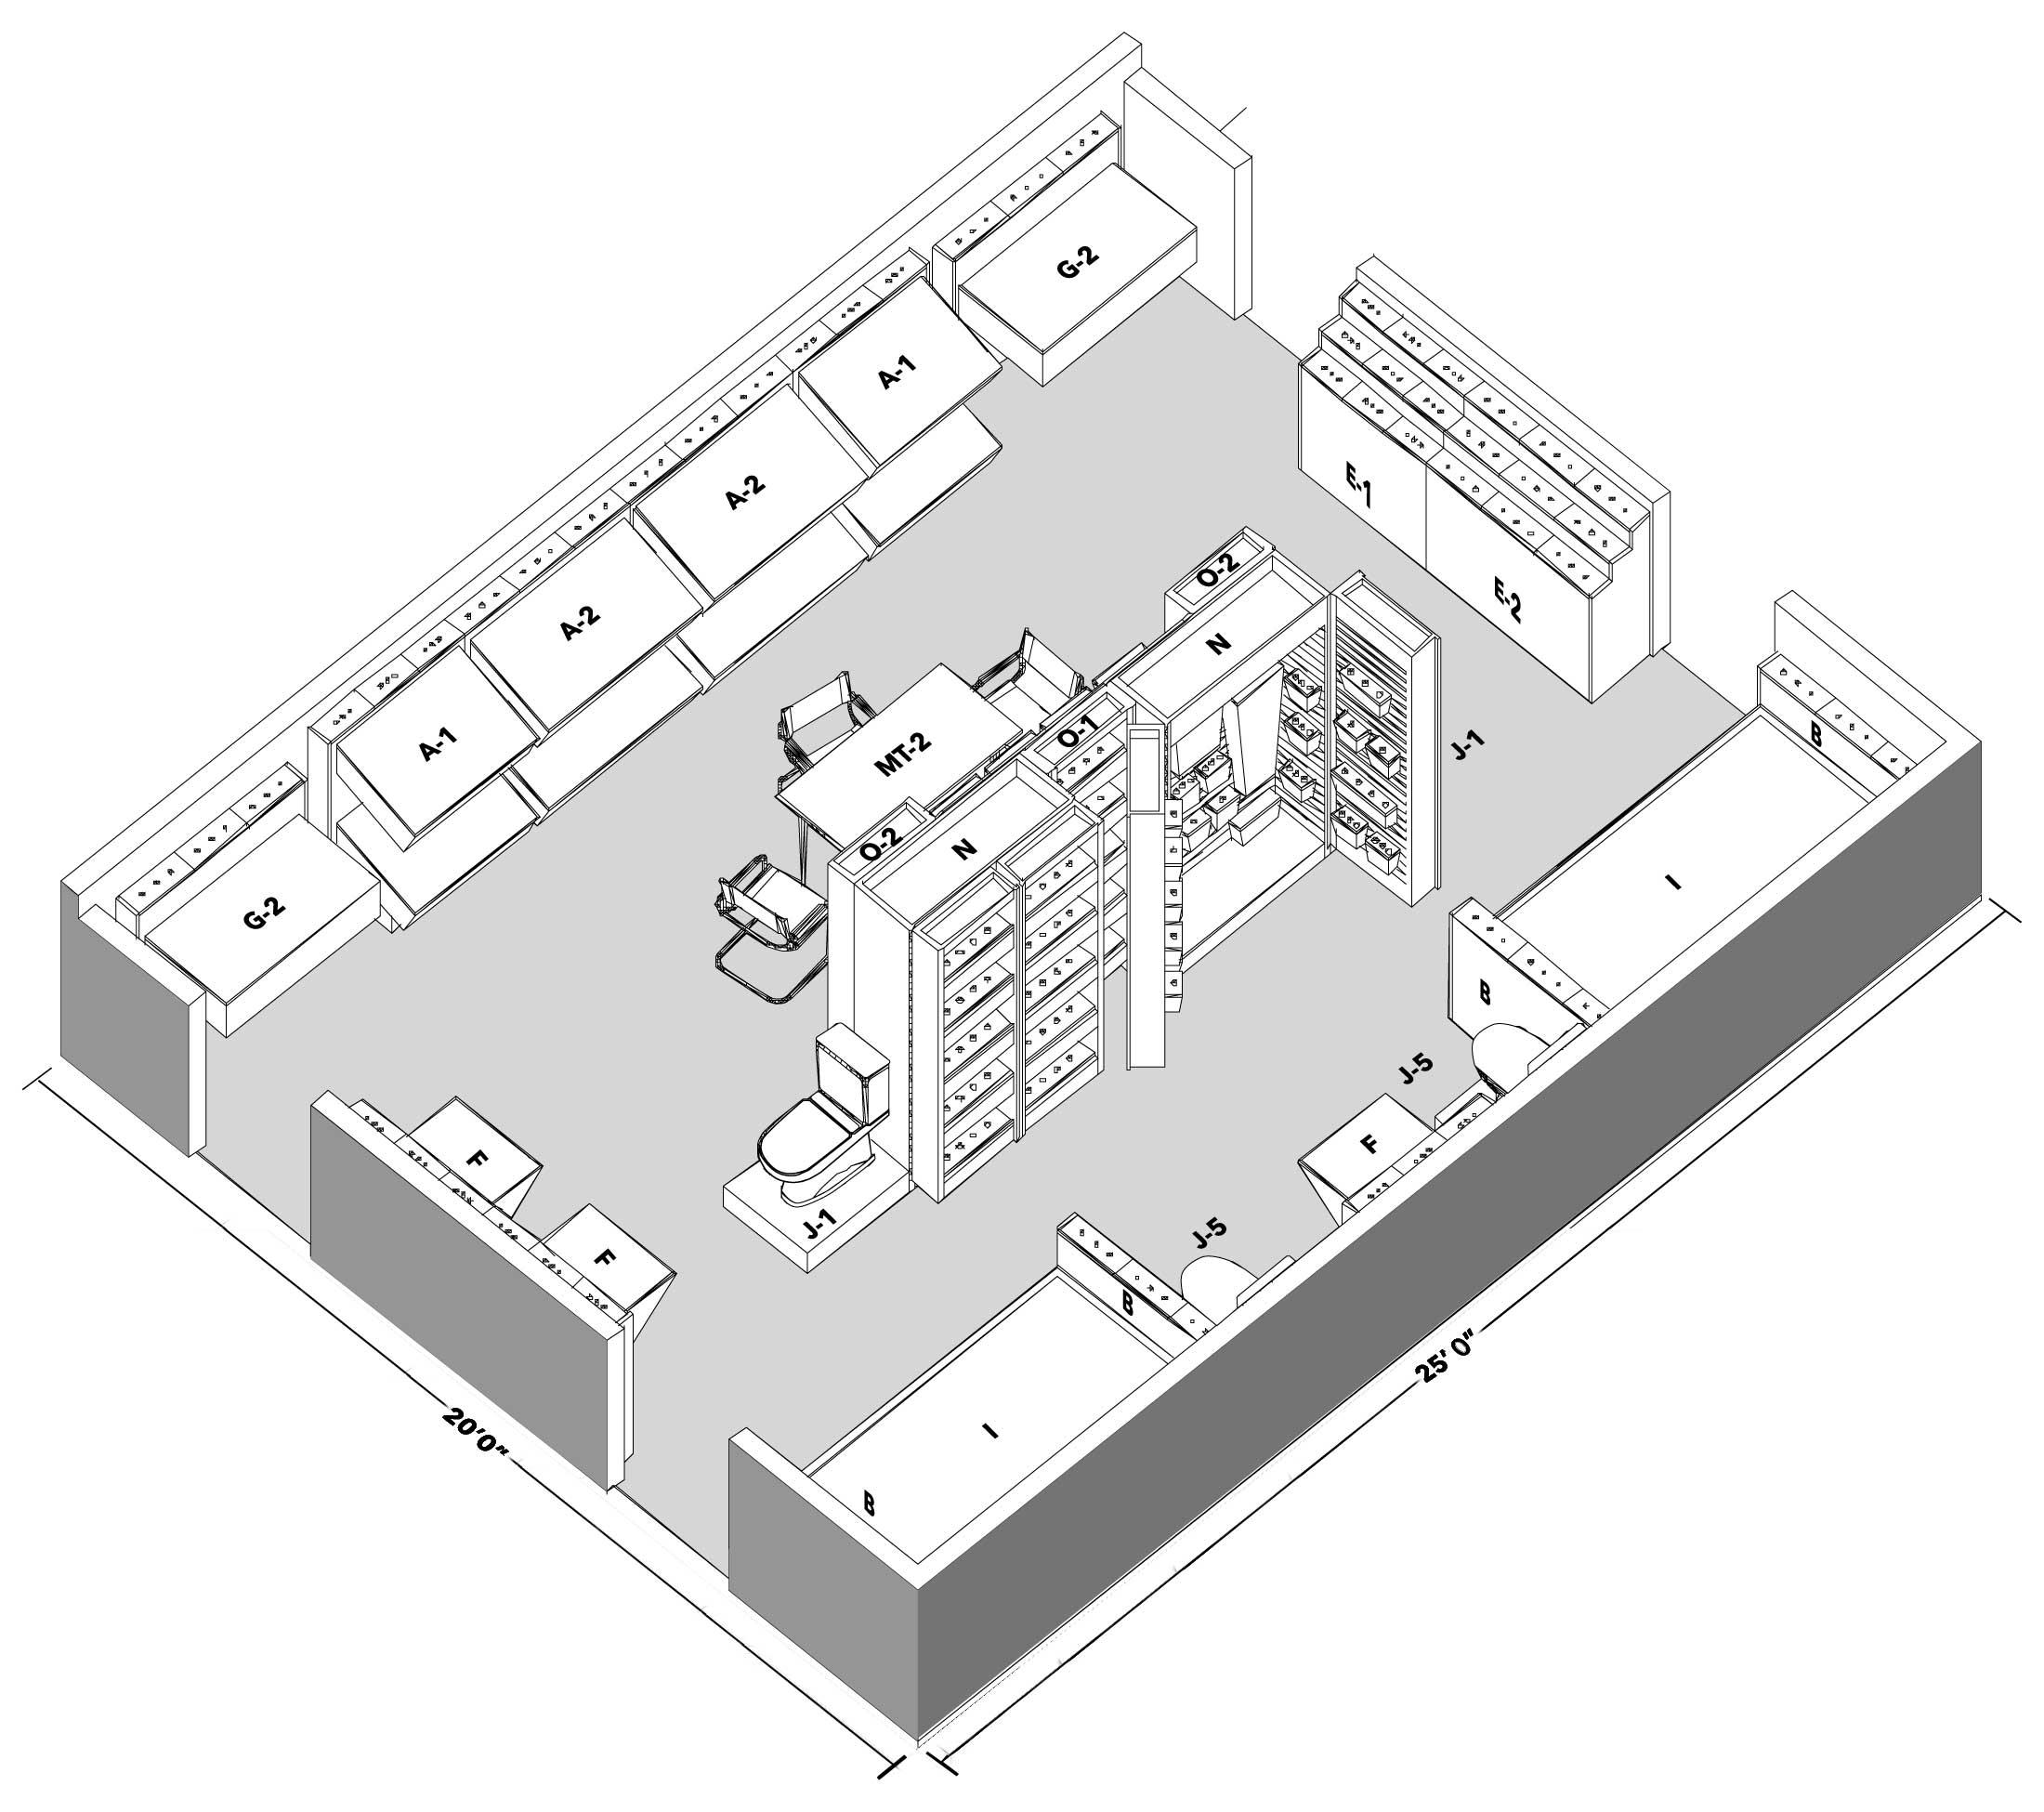 Garage Floor Plan New Car Updates 2019 2020 2011 Ranger Crew 500 Wiring Diagram David Hawkins Design Aspire Showroom Plans